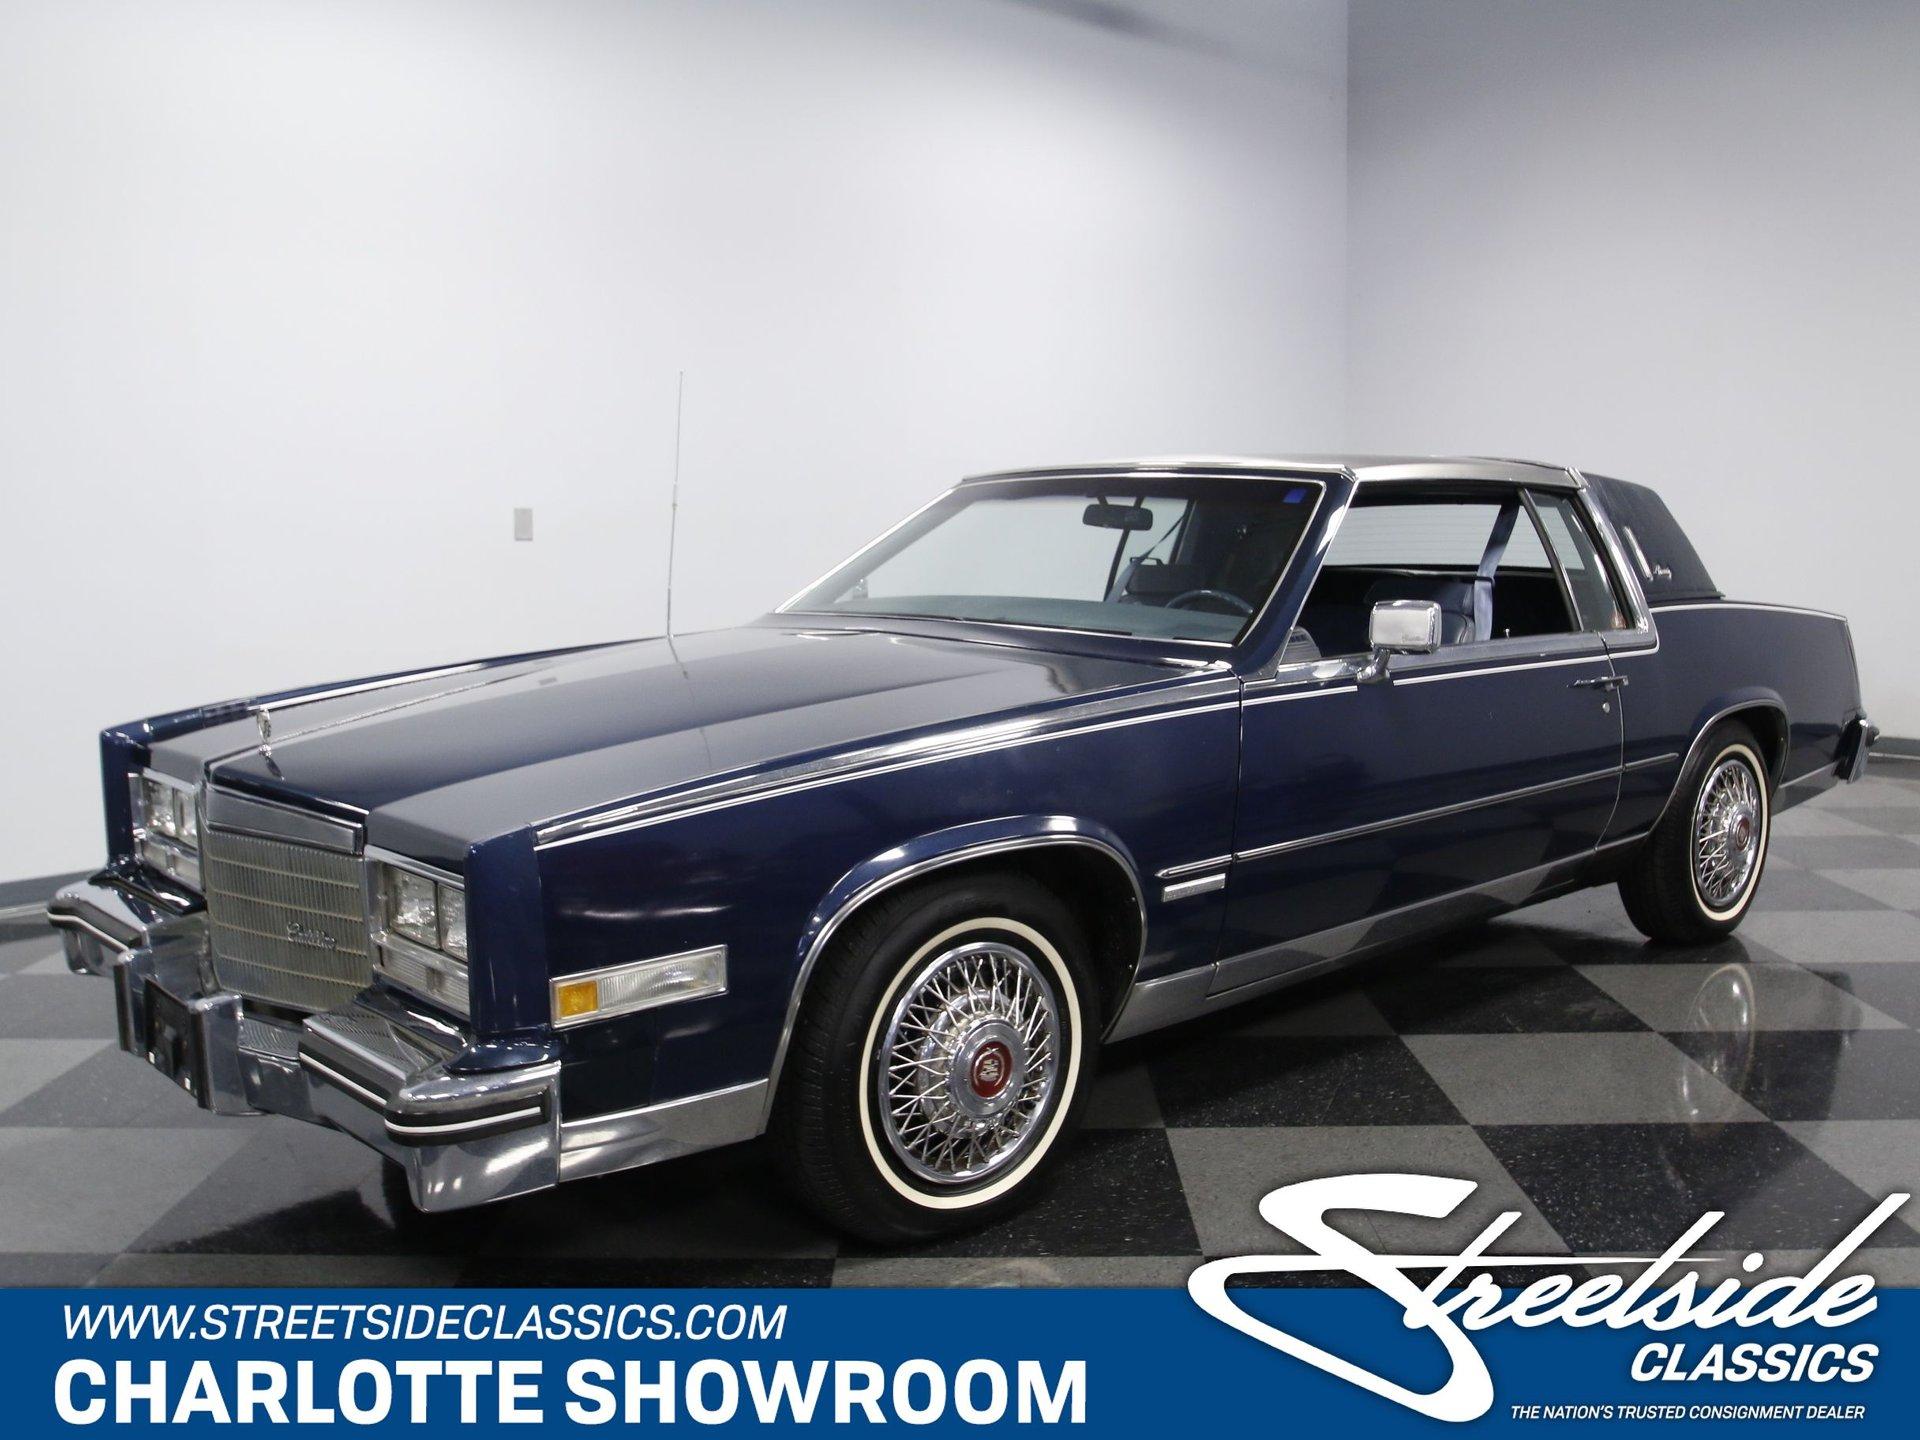 1983 cadillac eldorado streetside classics the nation s trusted classic car consignment dealer 1983 cadillac eldorado streetside